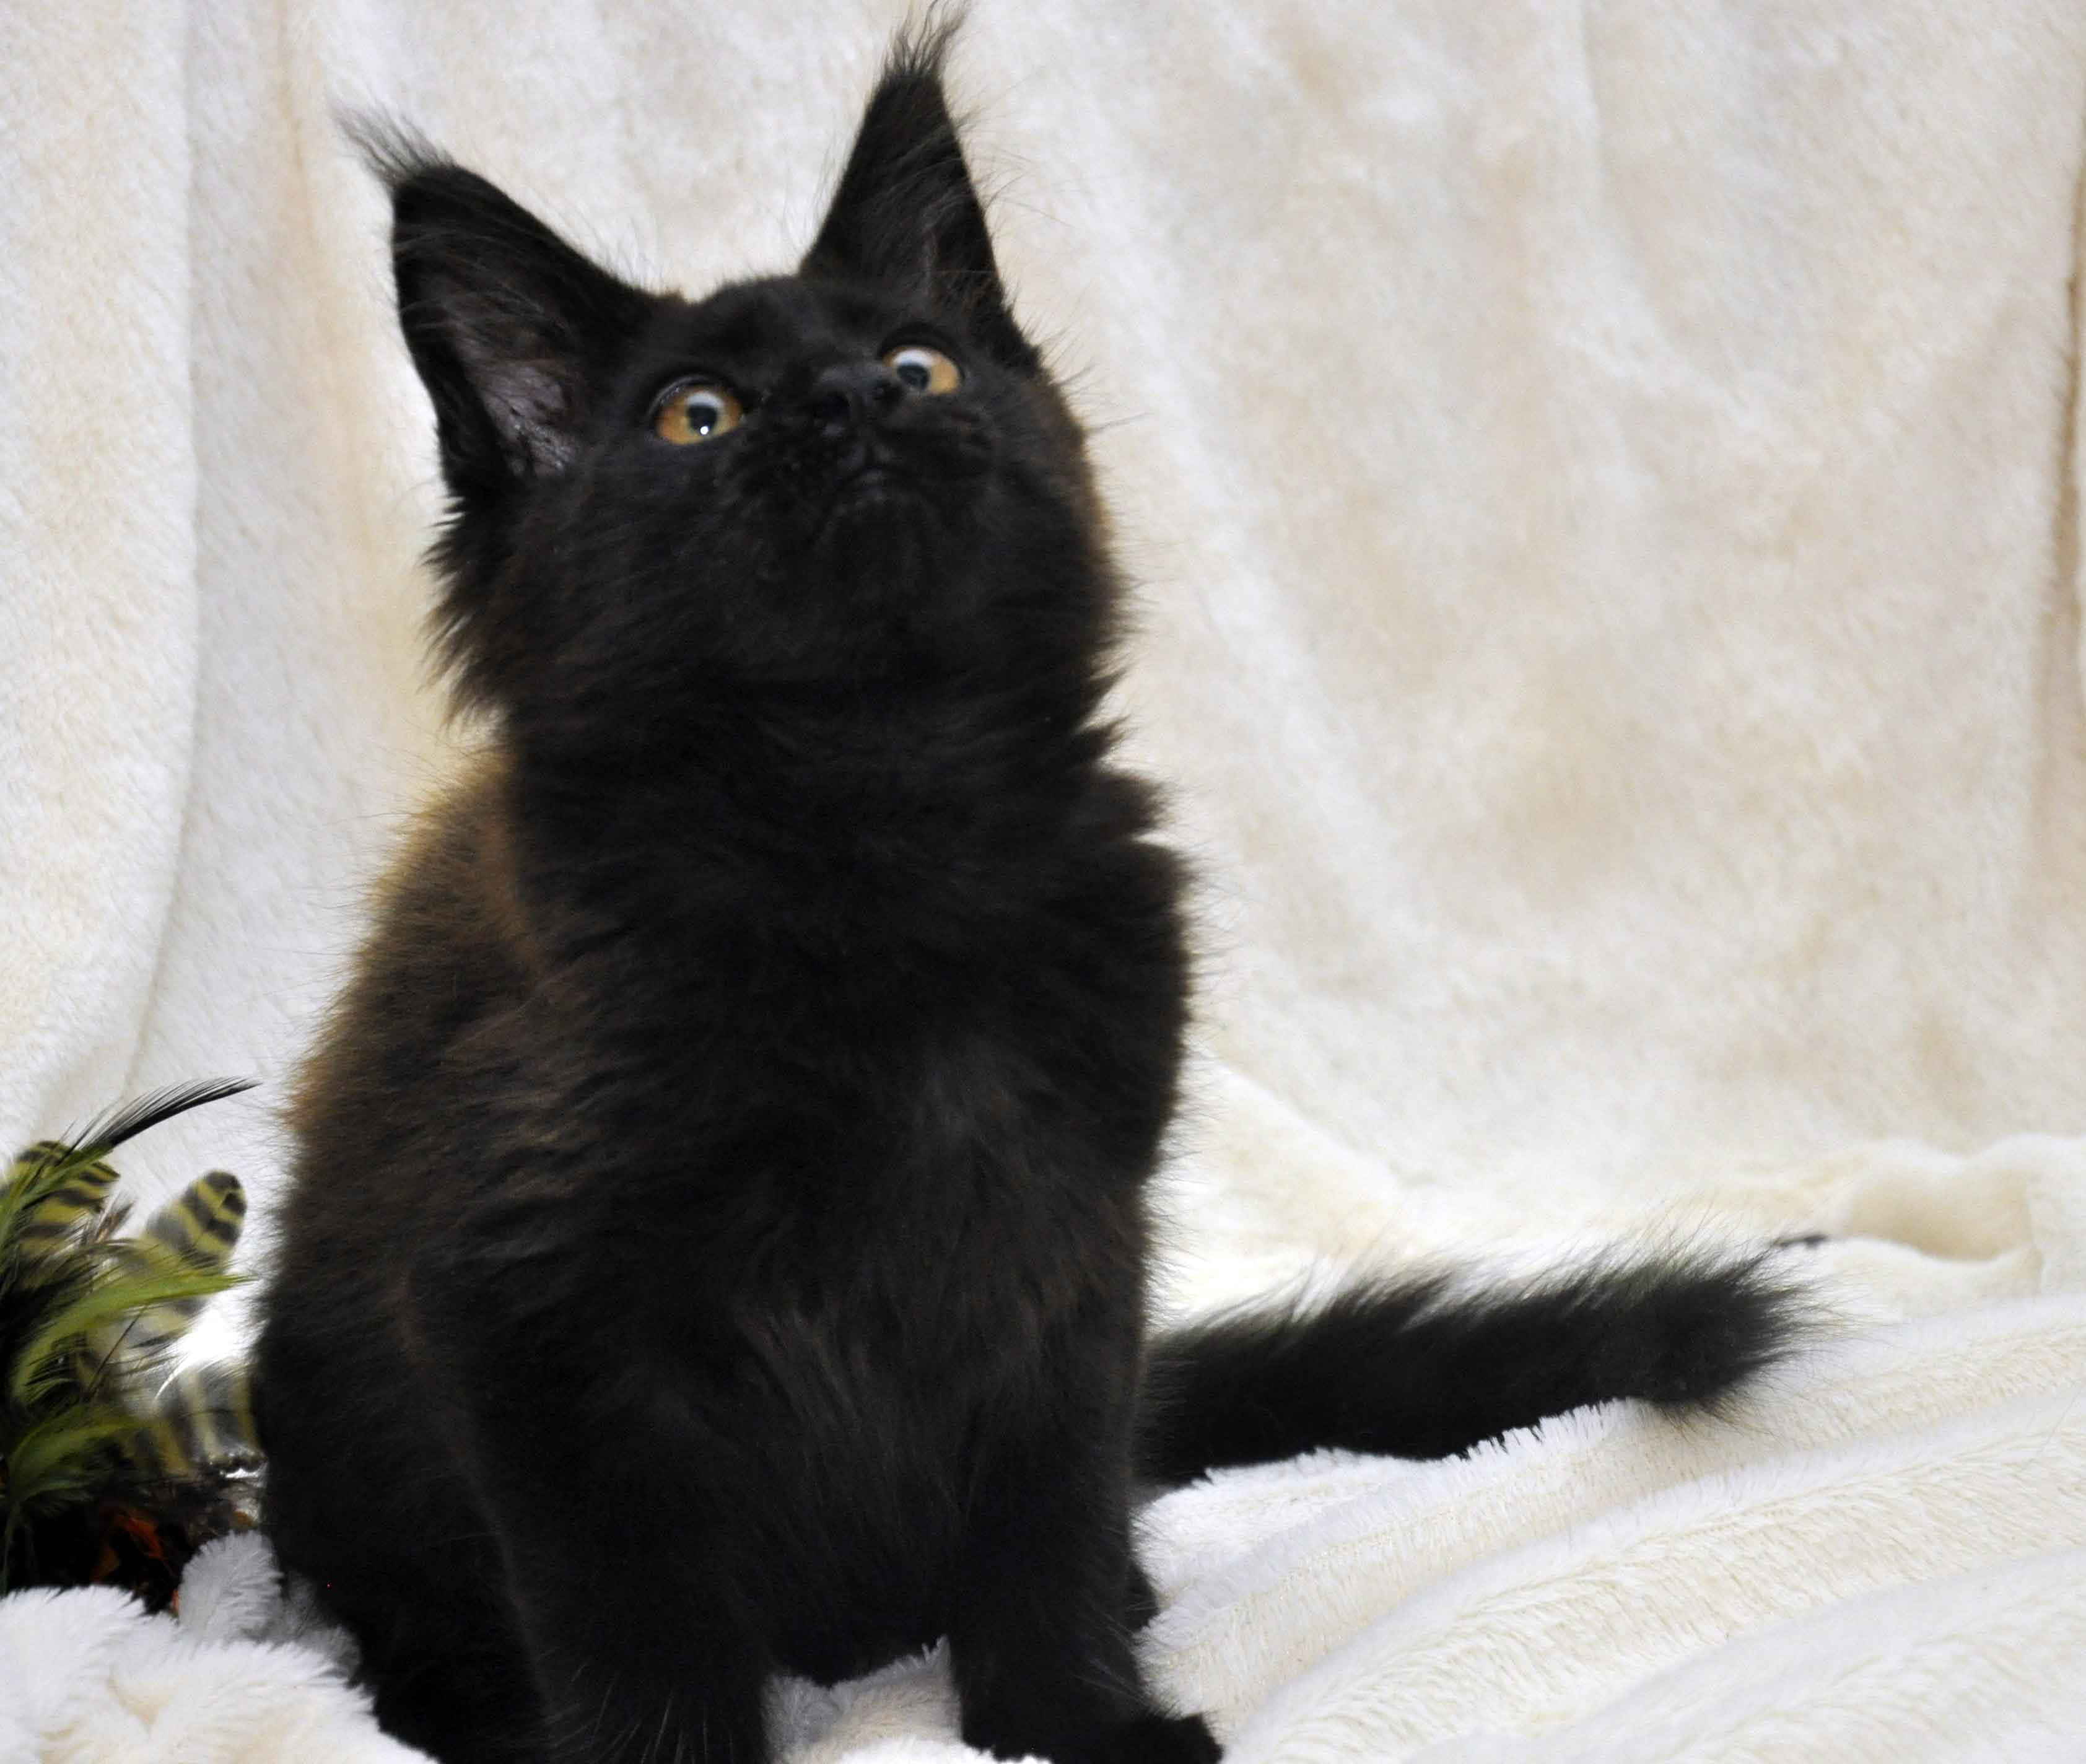 Кот мейн кун JULIOPOLIS возраст 3.5 месяца фото9